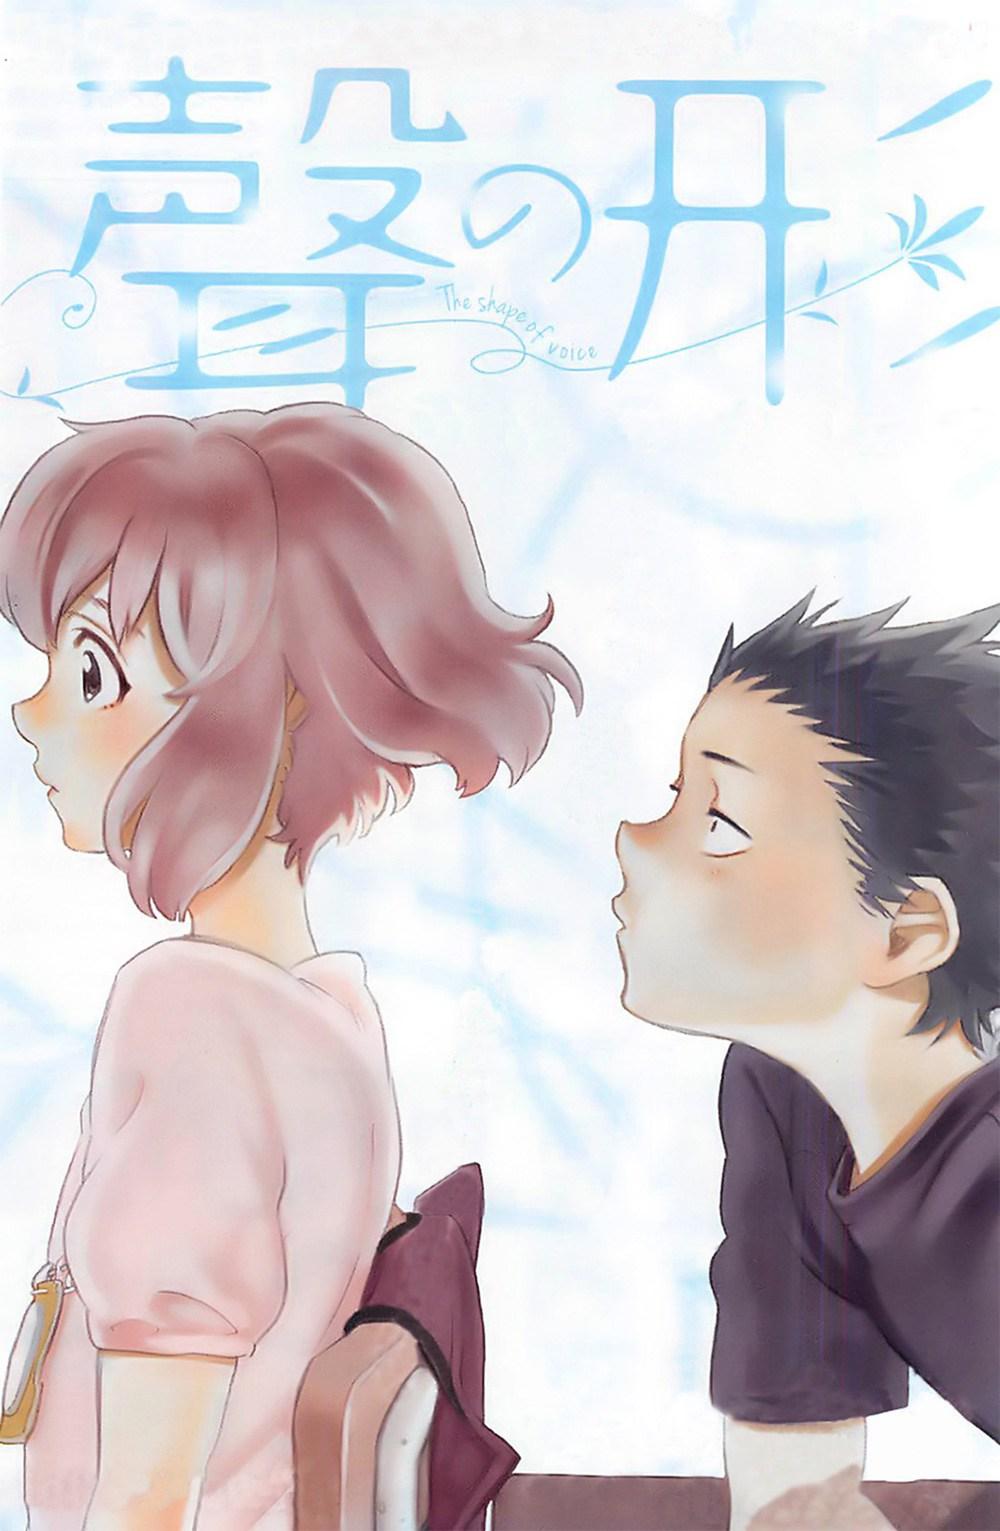 Kyoto-Animation-to-Produce-Koe-no-Katachi-Anime-Film-Share